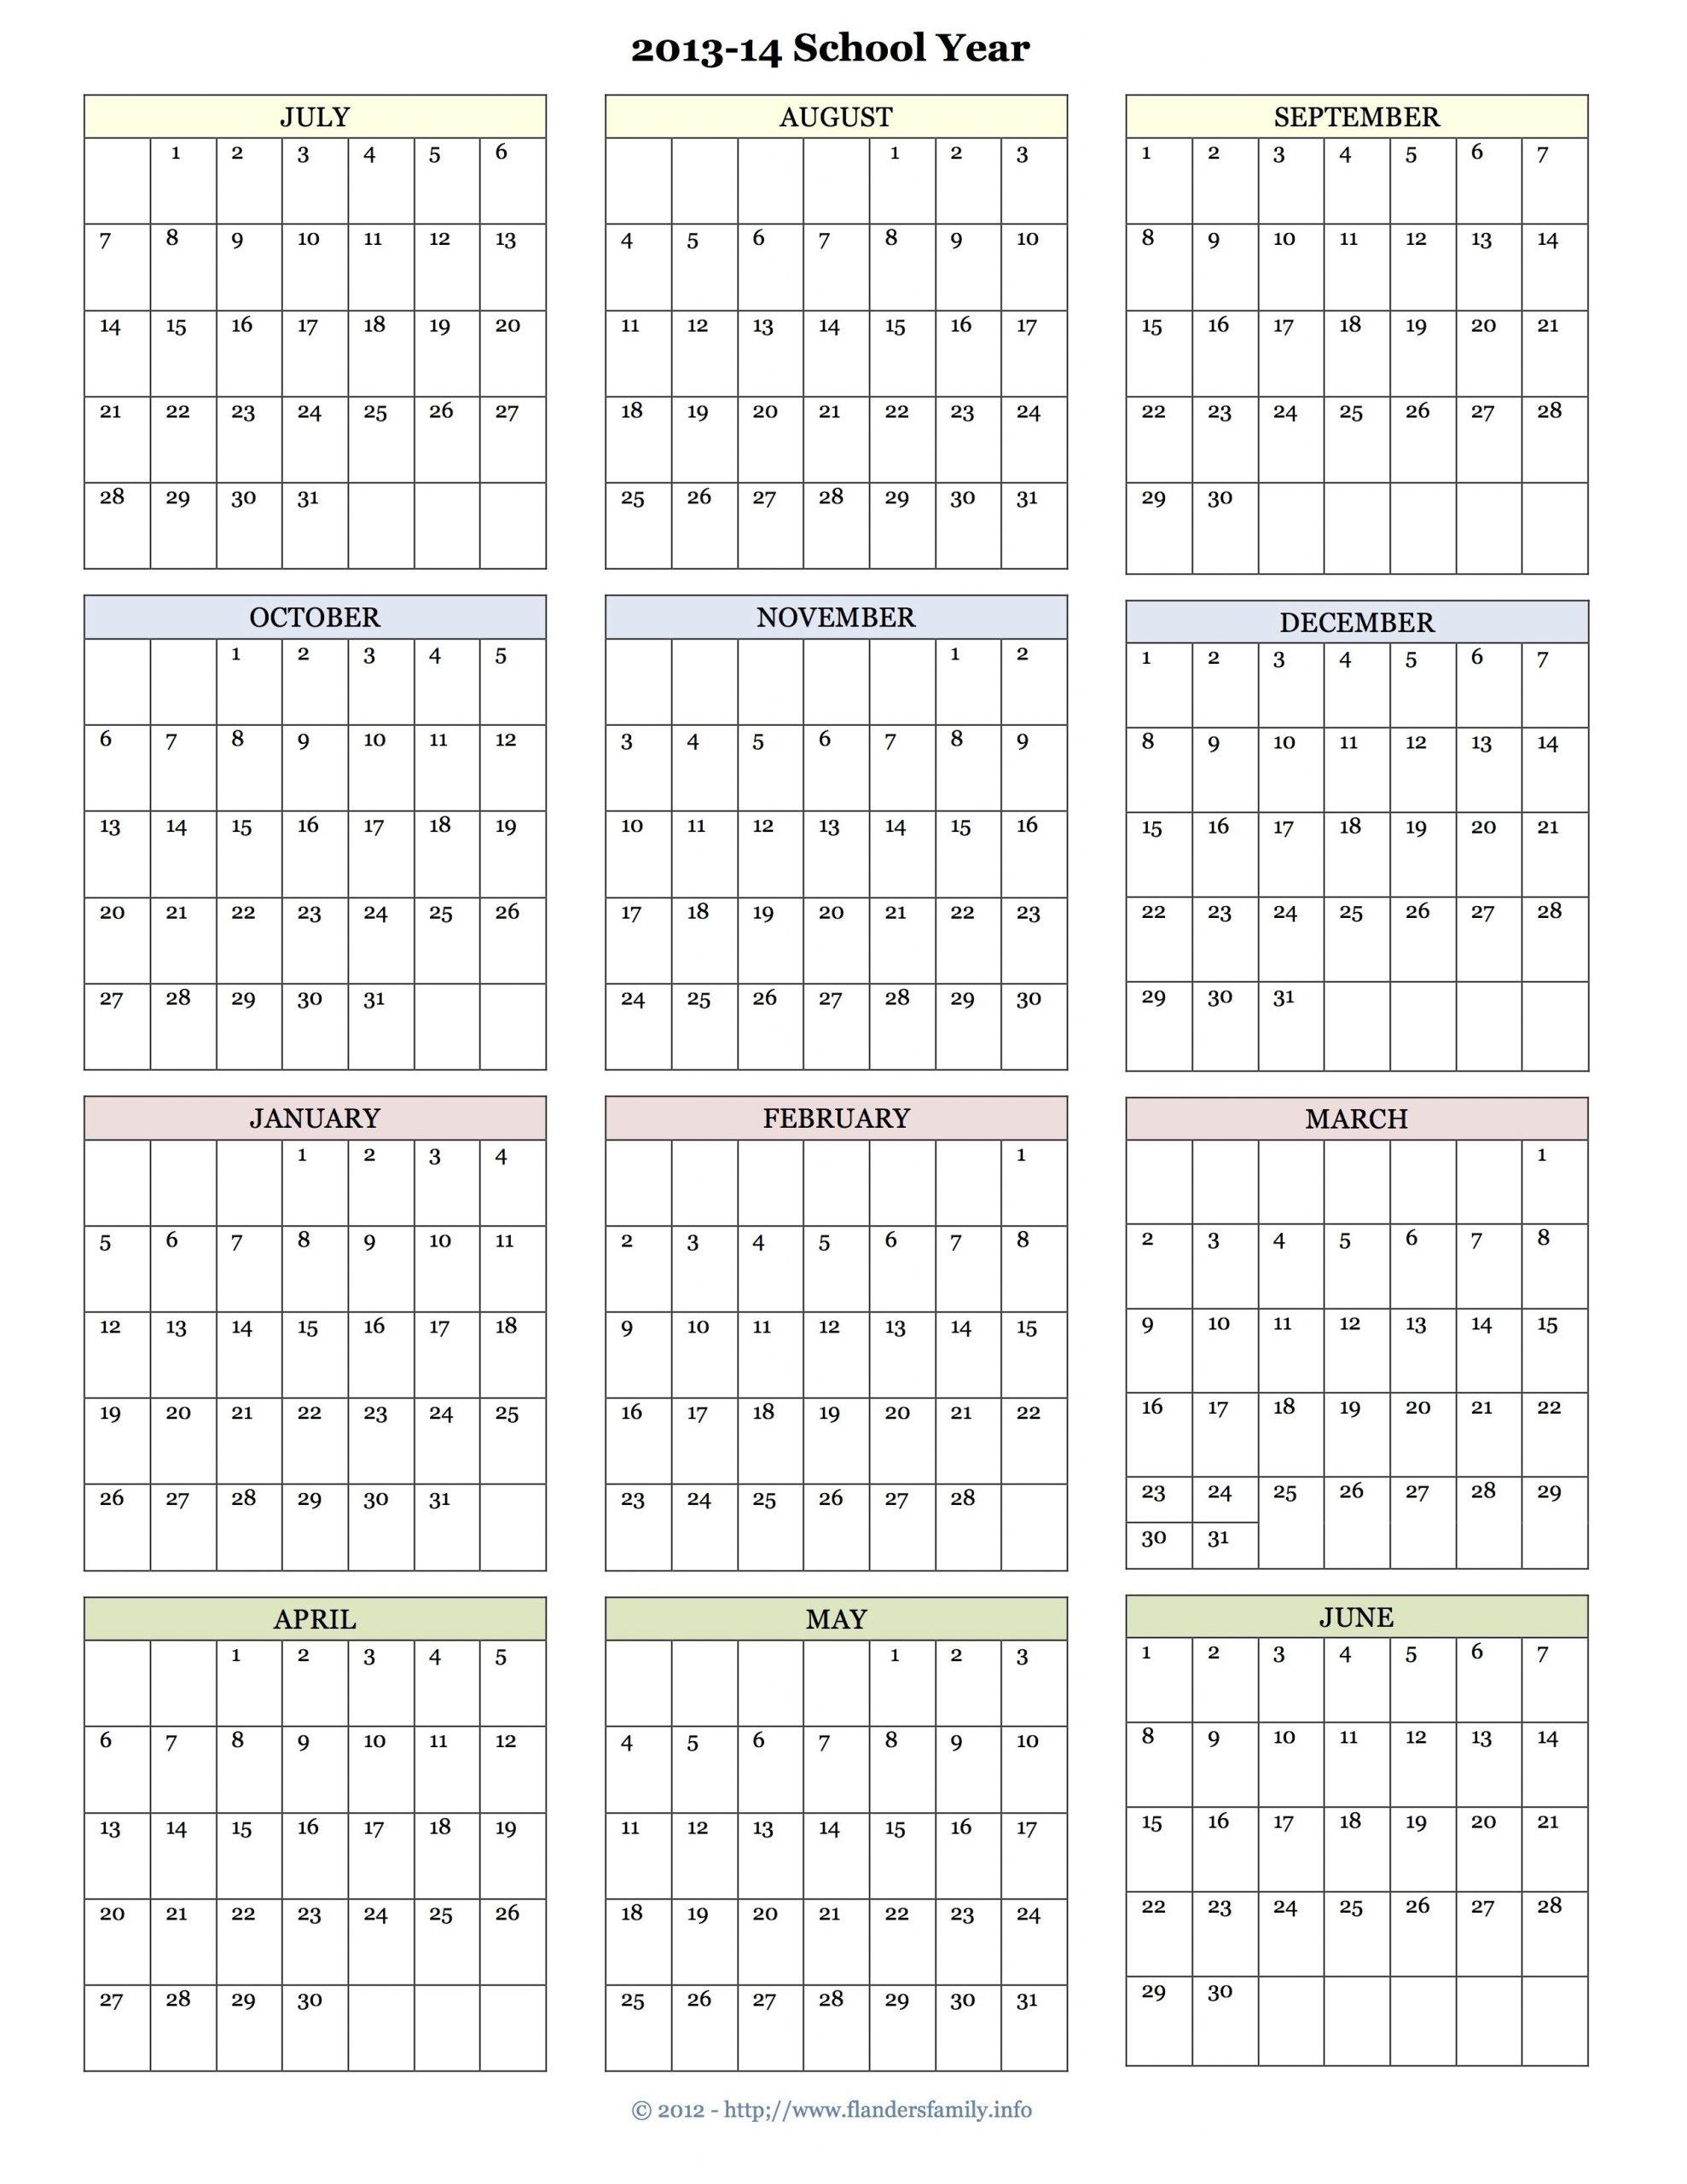 Depo Shot Calendar 2019 Depo Provera Injection Calendar 2018